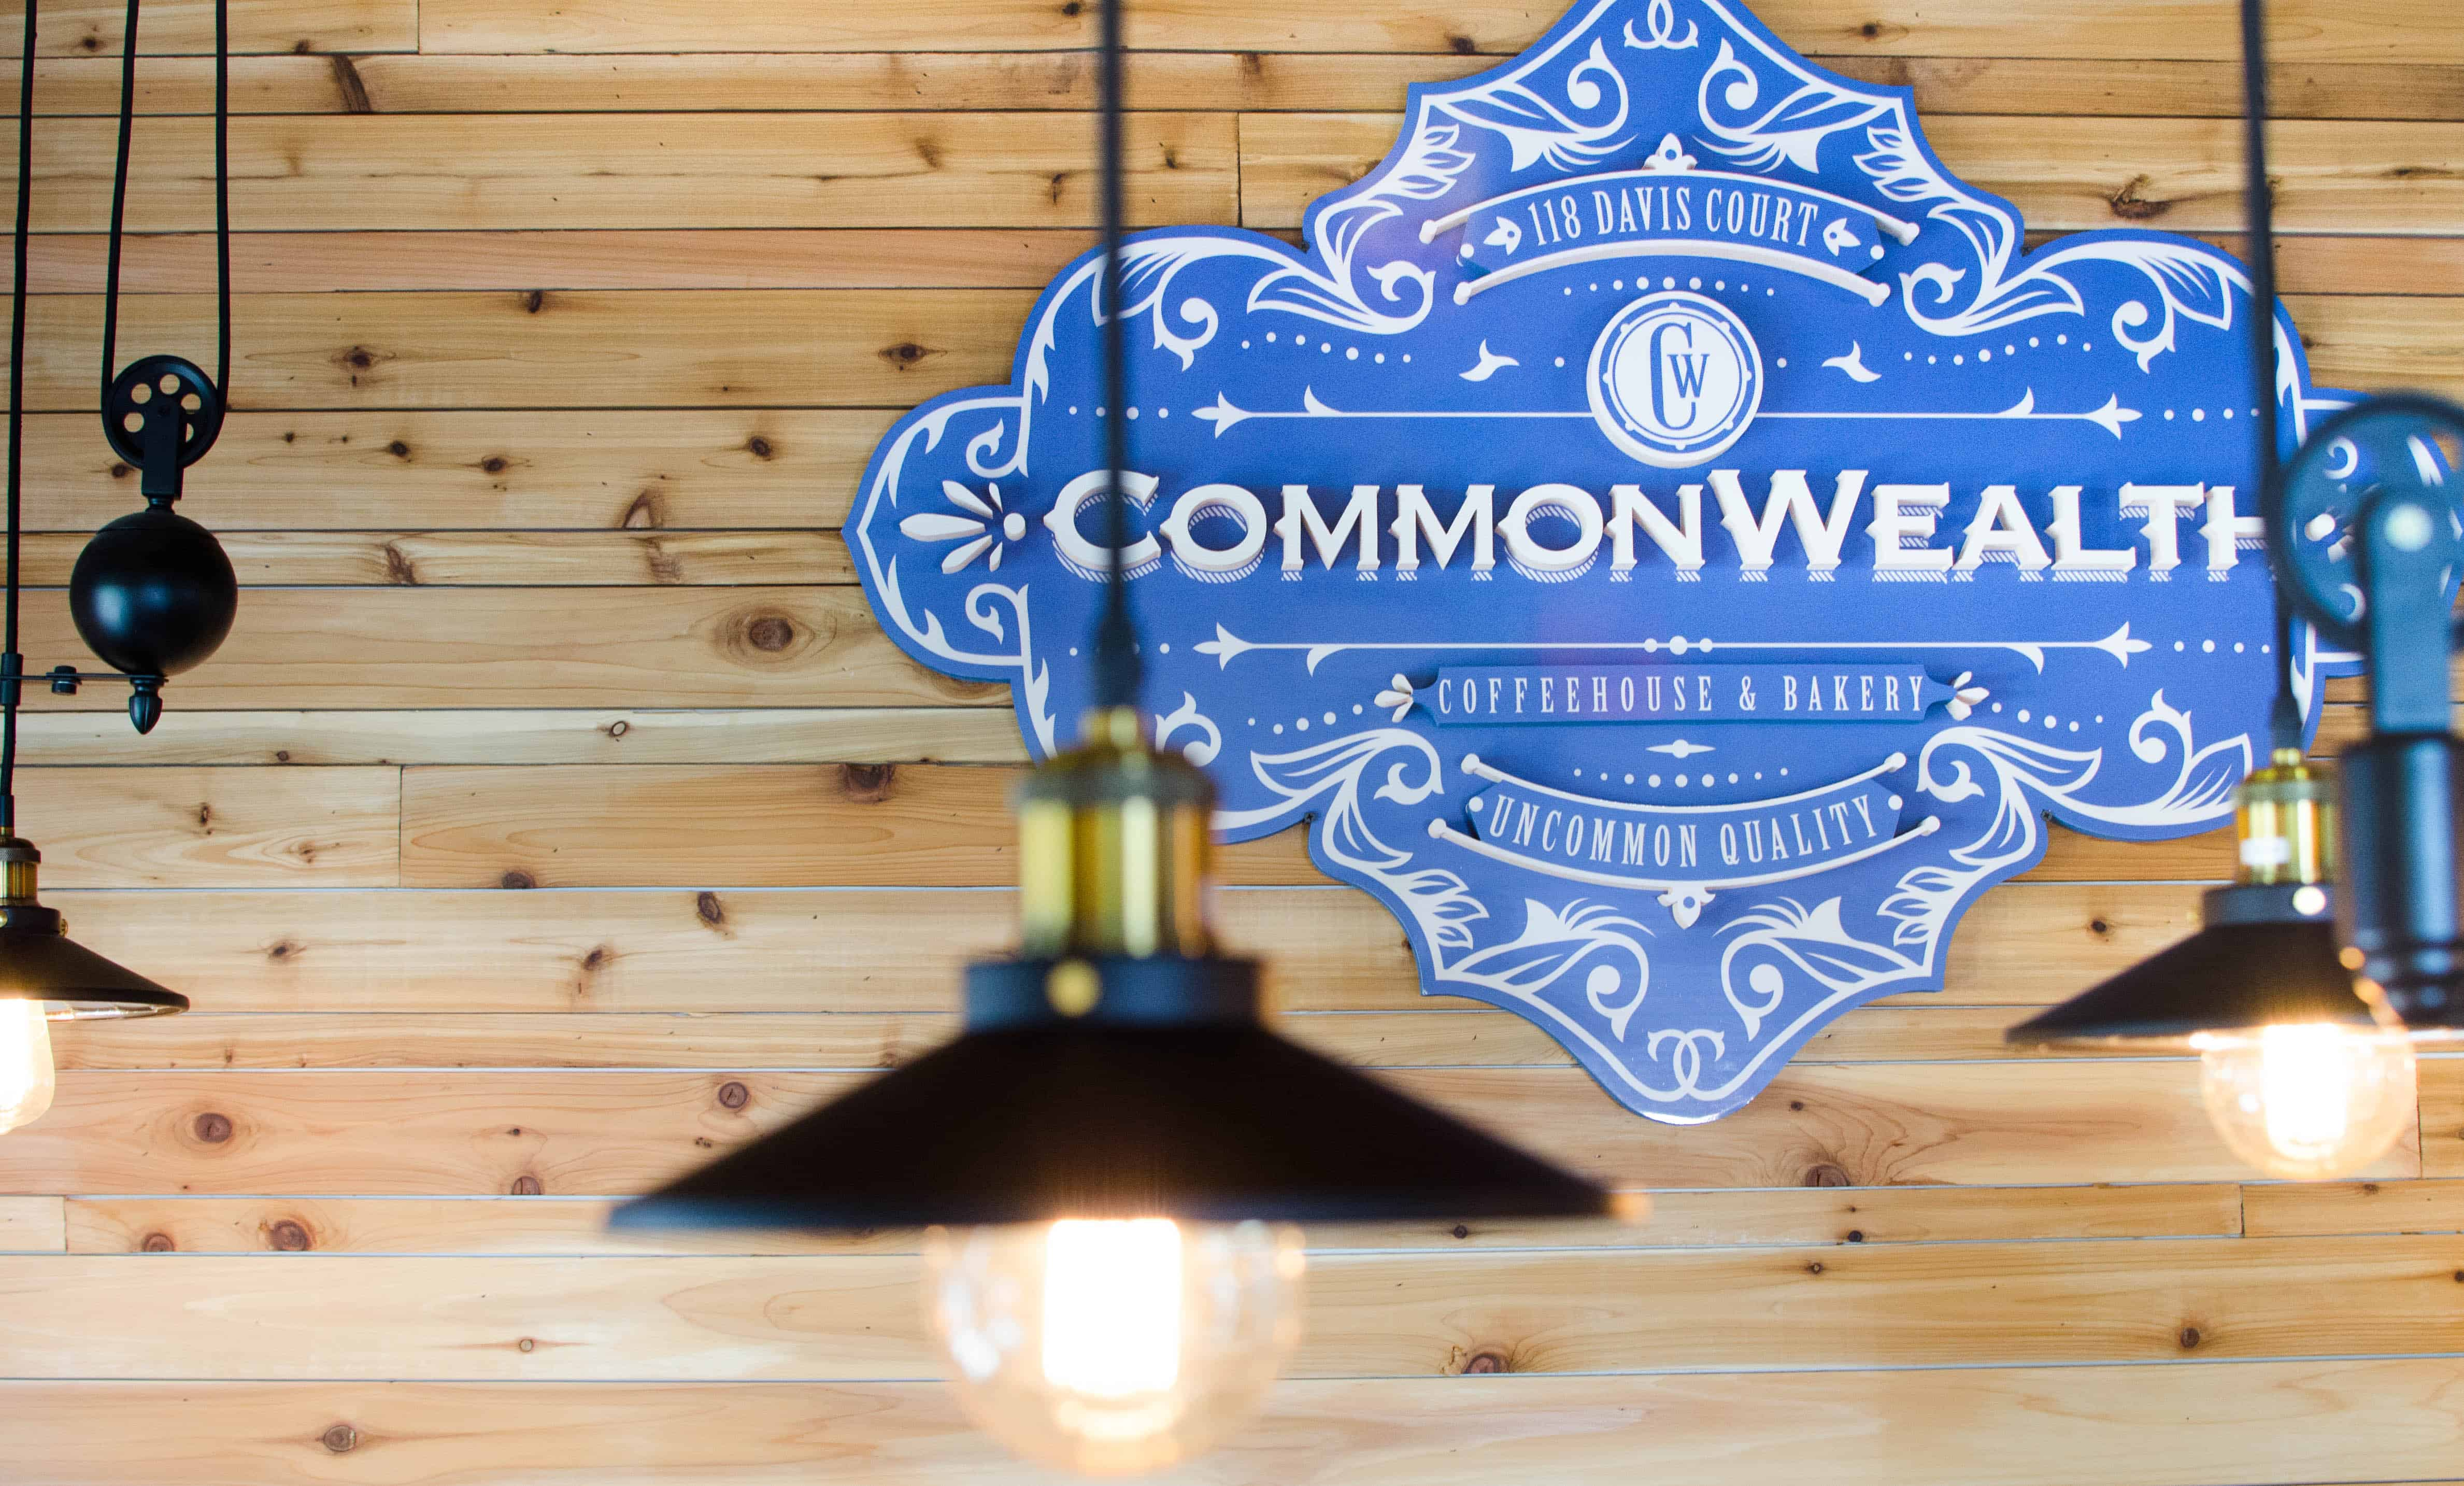 commonwealth9-1-of-1